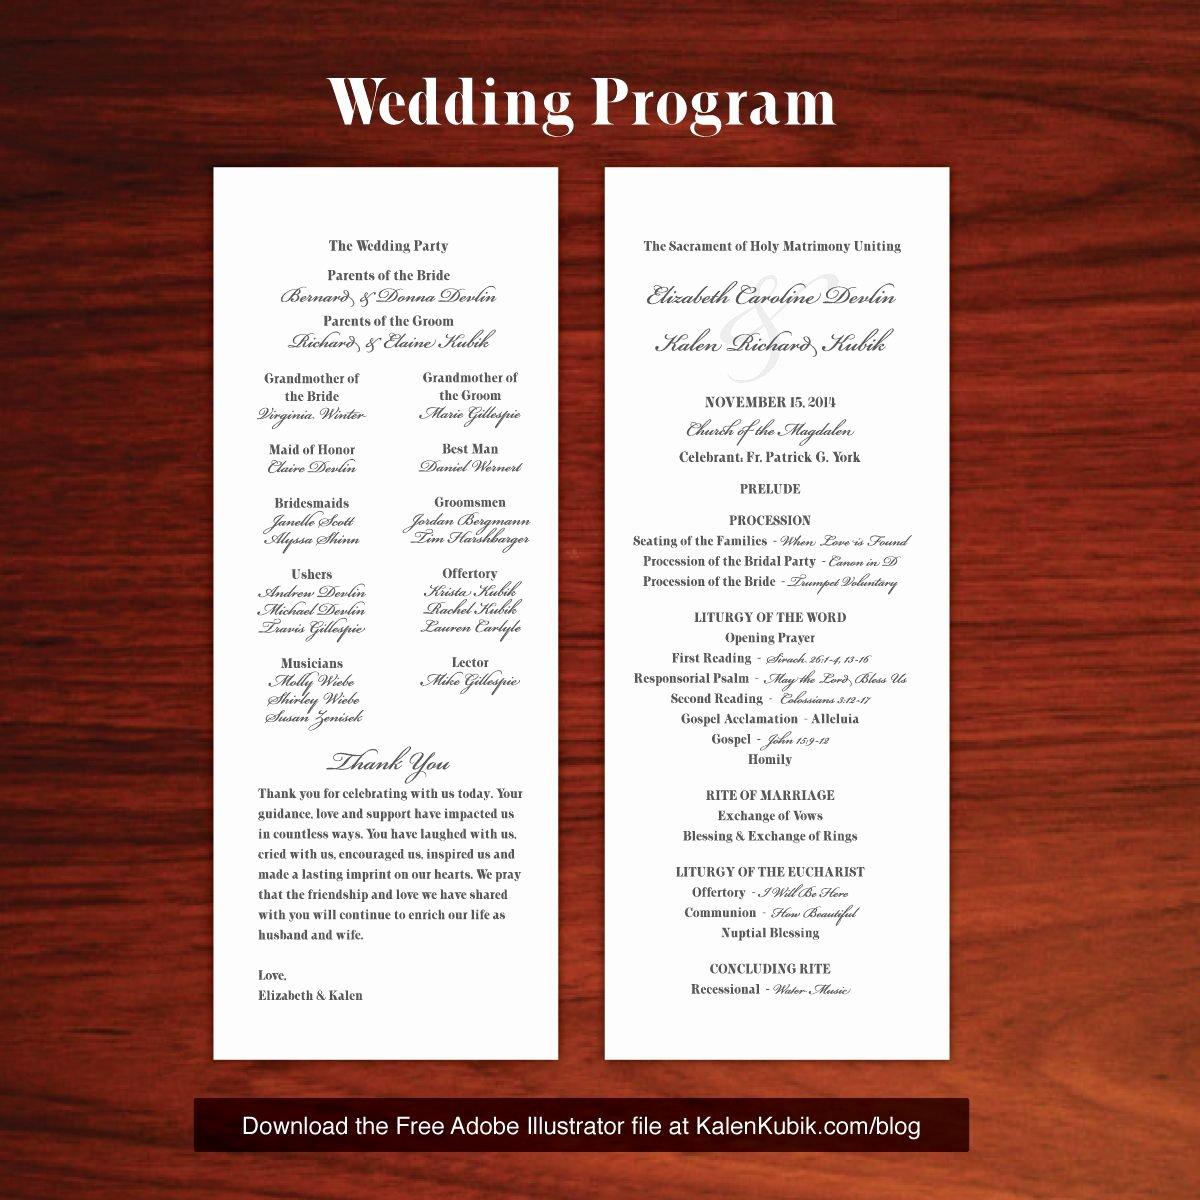 Catholic Wedding Program Templates Free Elegant Free Diy Catholic Wedding Program Ai Template I M A